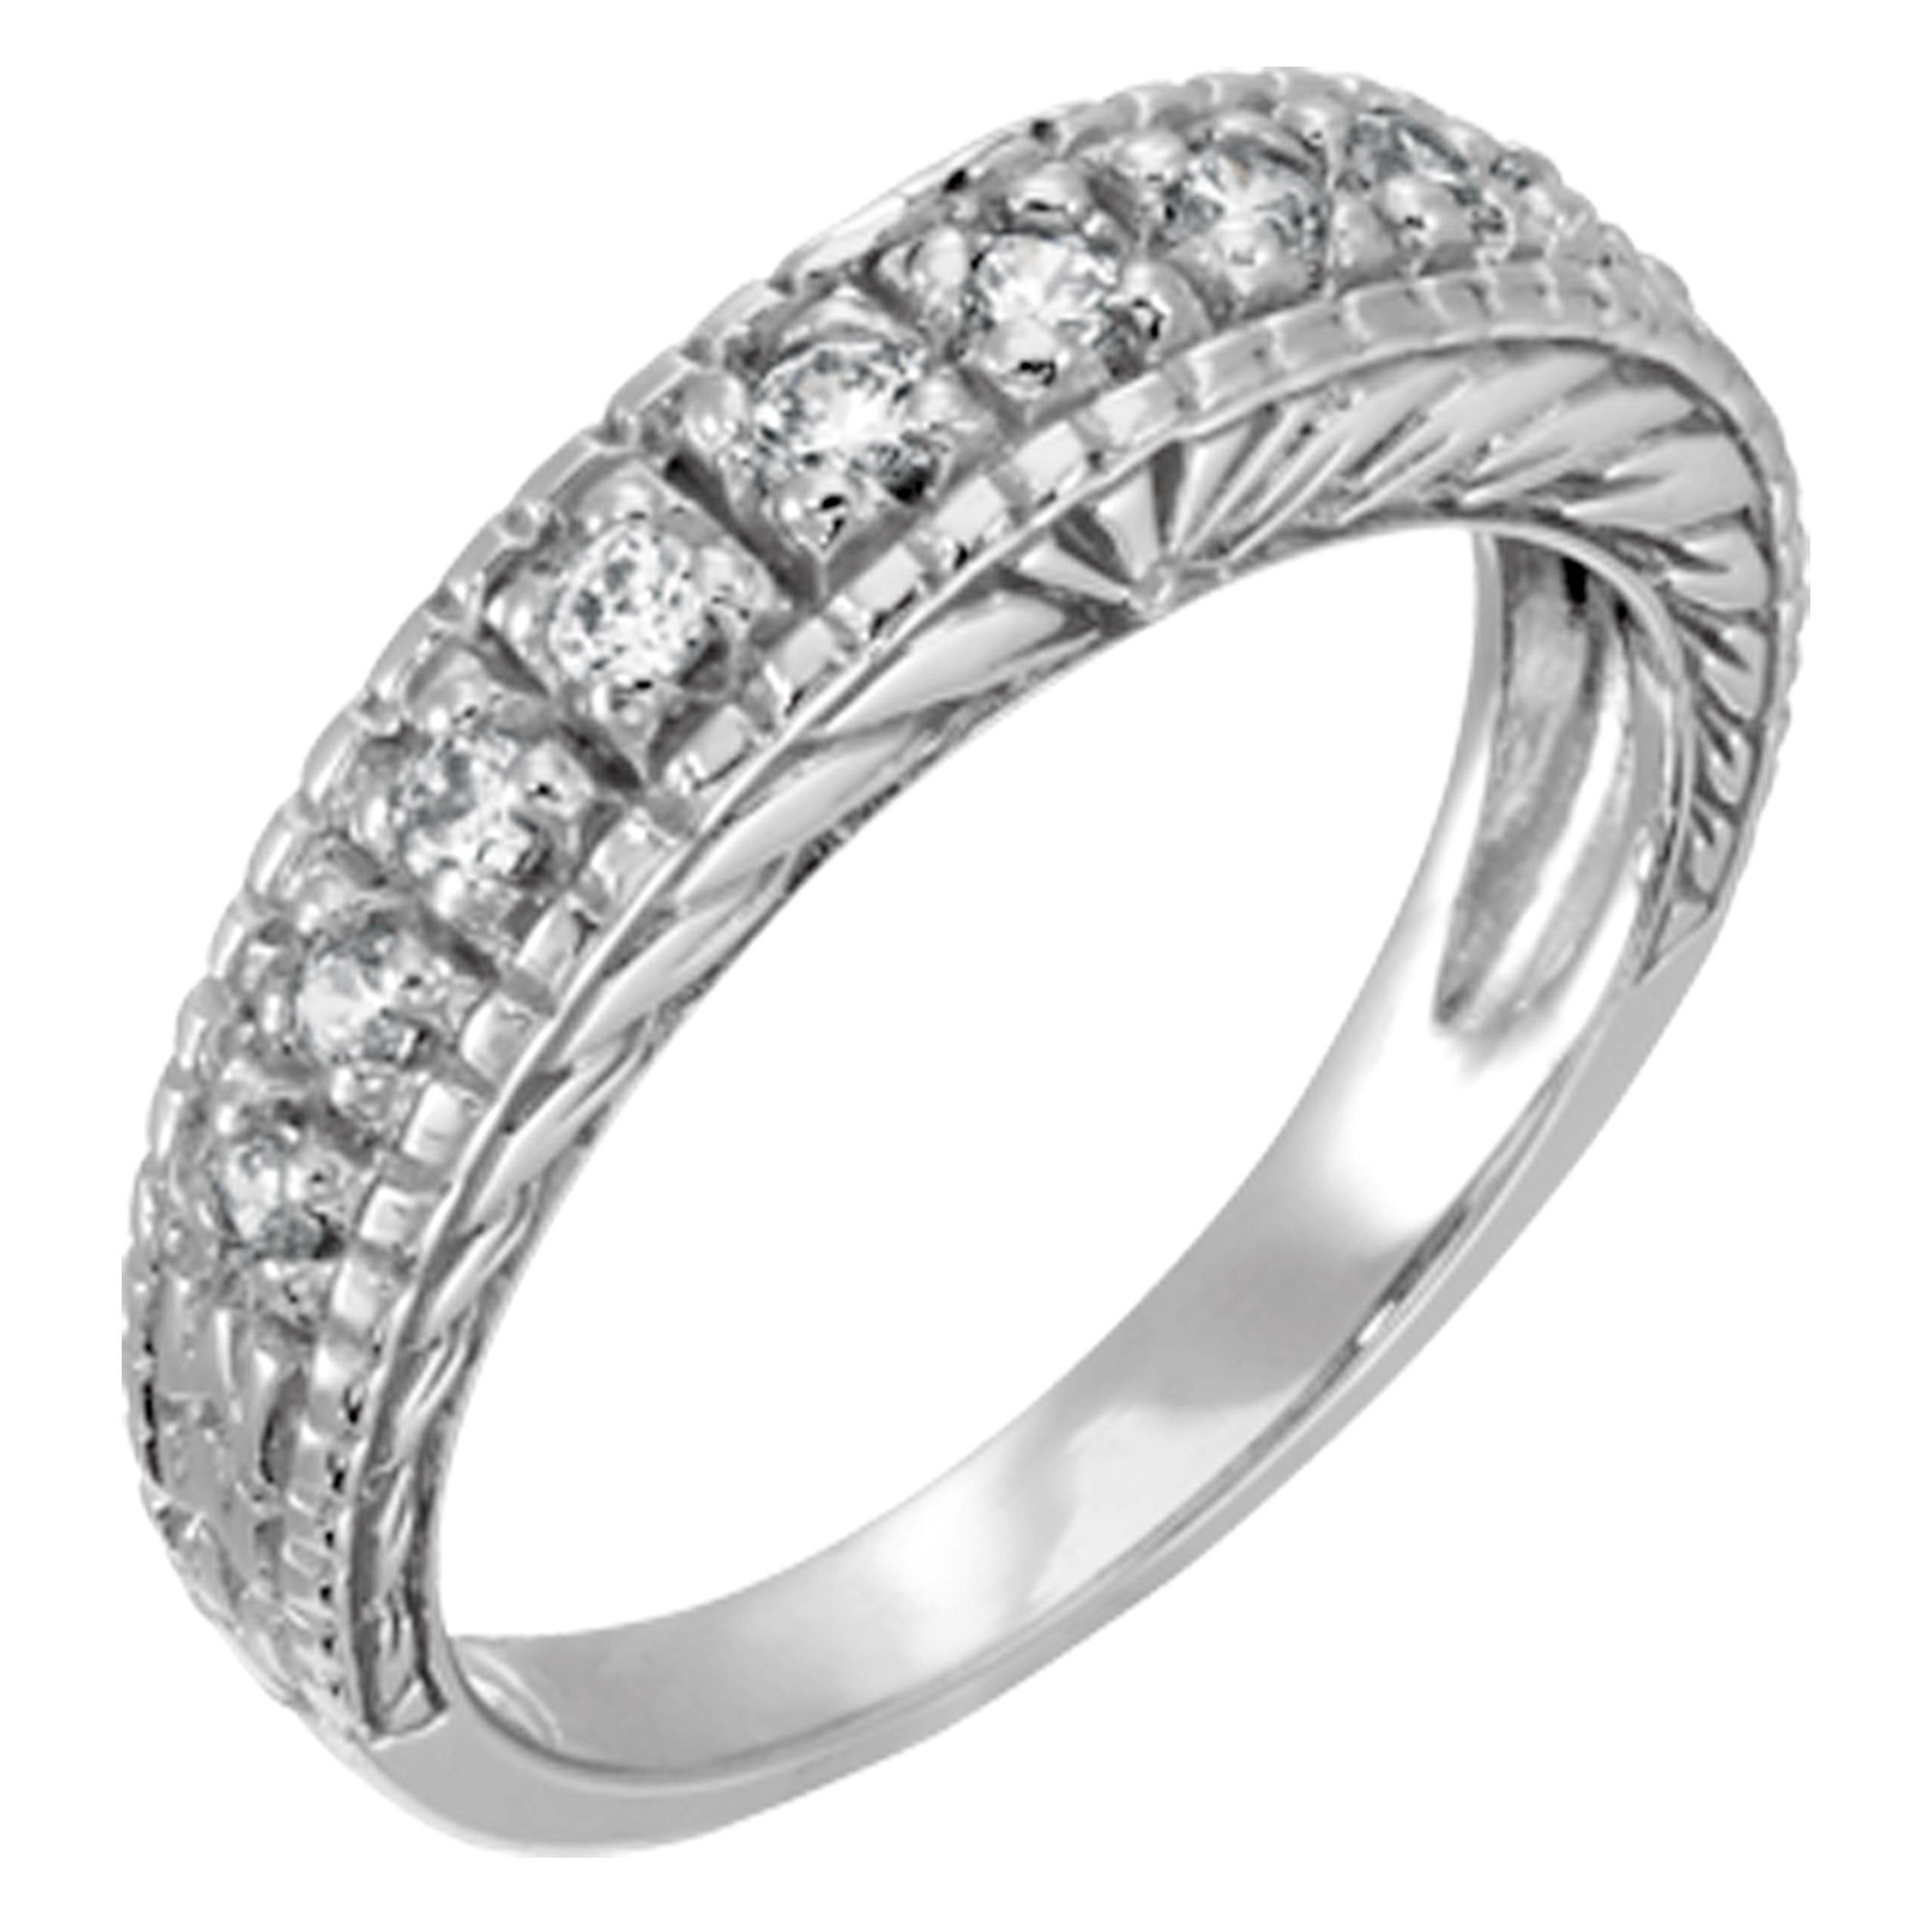 Diamond Nexus Juliette Wedding Band Wedding Ring Bands Wedding Bands Matching Band